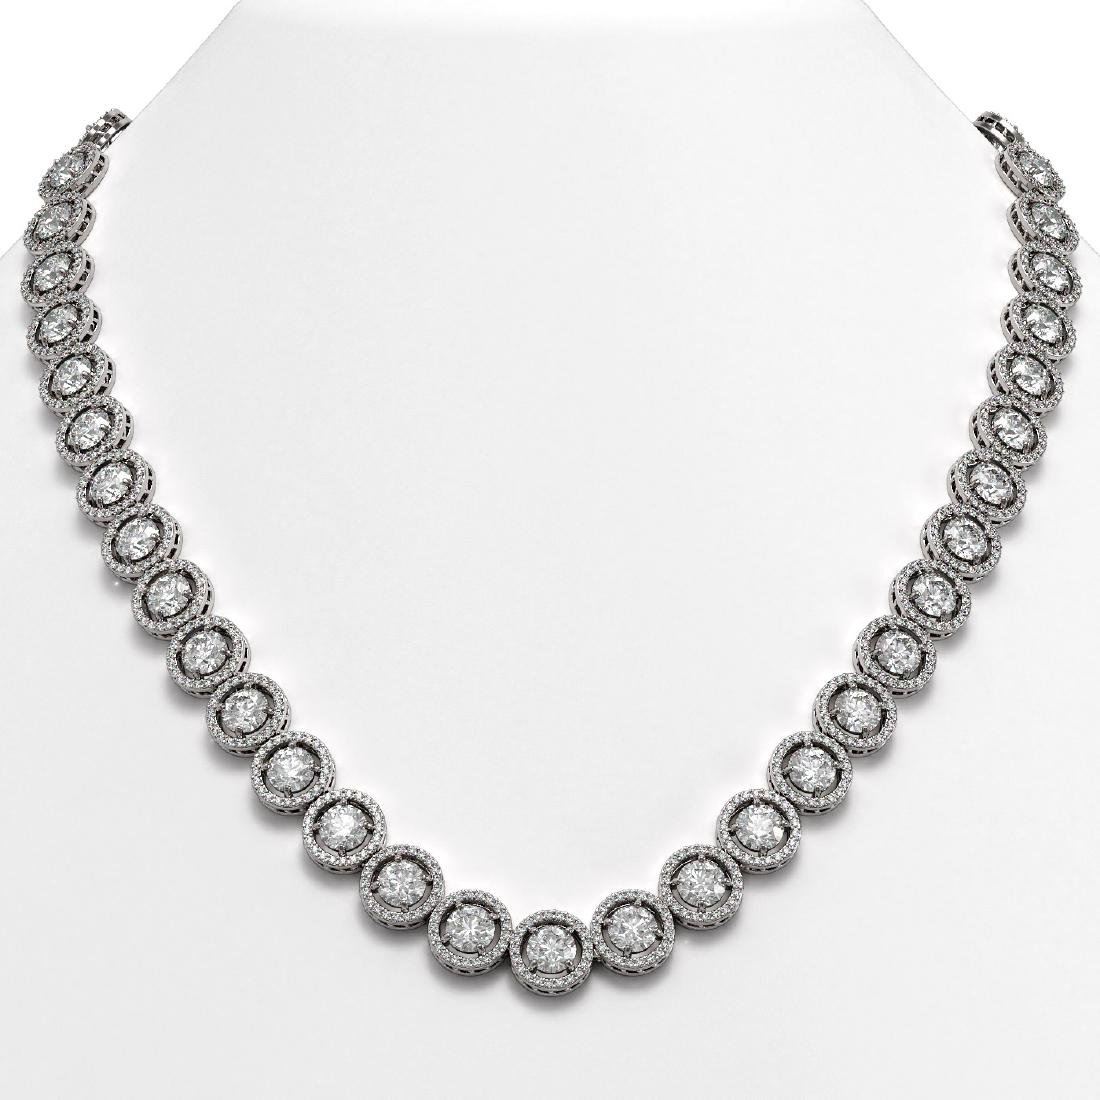 35.32 CTW Diamond Designer Necklace 18K White Gold